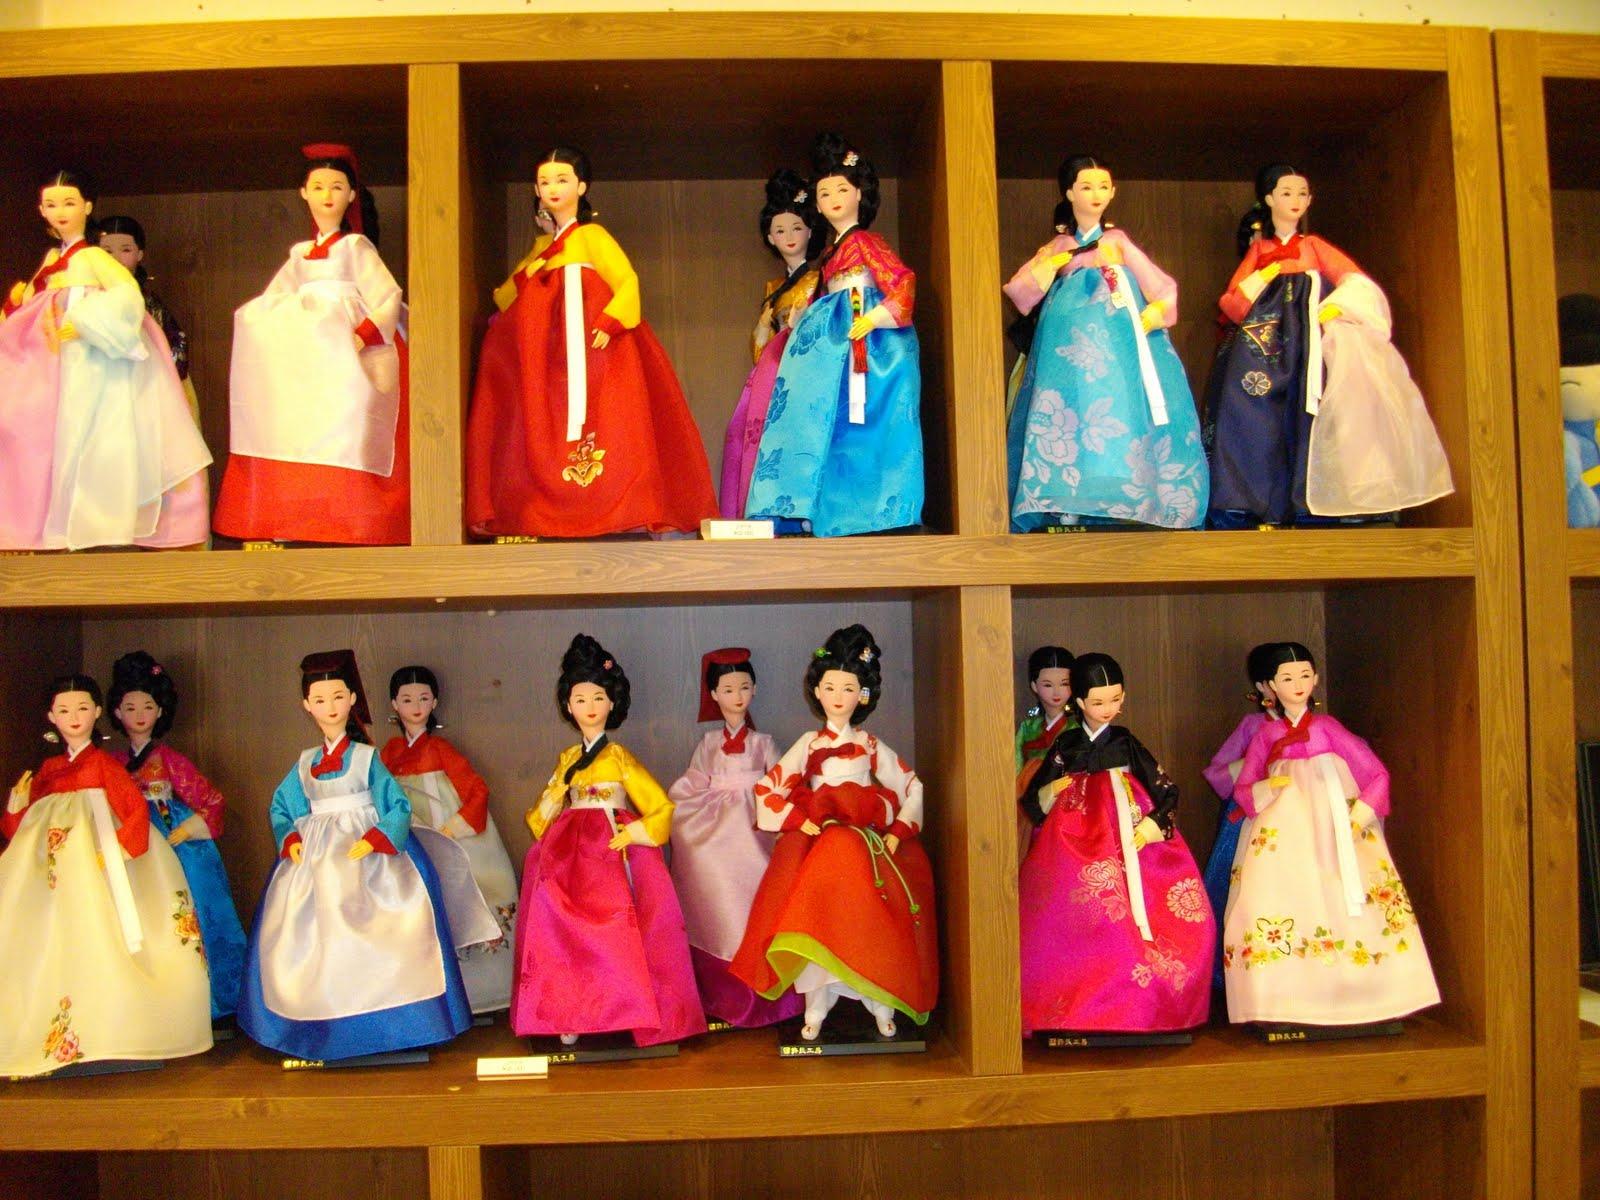 Korean dolls 5